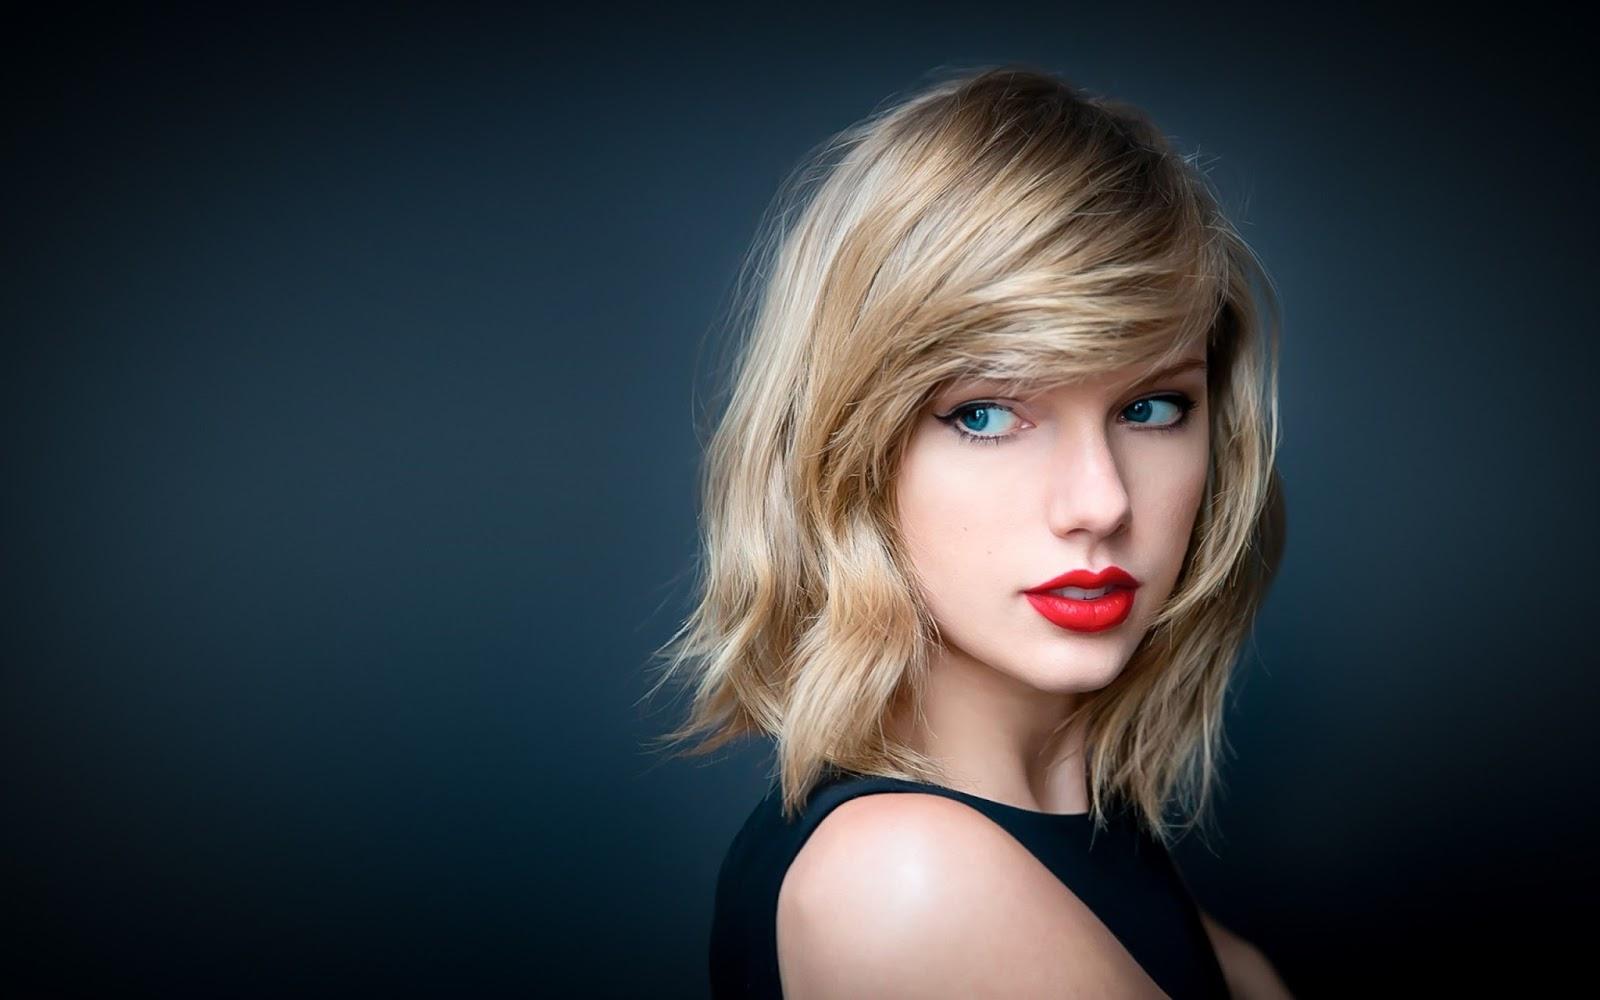 iLoveiTunesMusic.net Taylor-Swift-HD-Wallpapers Taylor Swift - Music Video [iTunes Plus Discography] DIscographies iTunes Plus AAC M4A Music Video  Taylor Swift ITUNES PLUS A Day to Remember